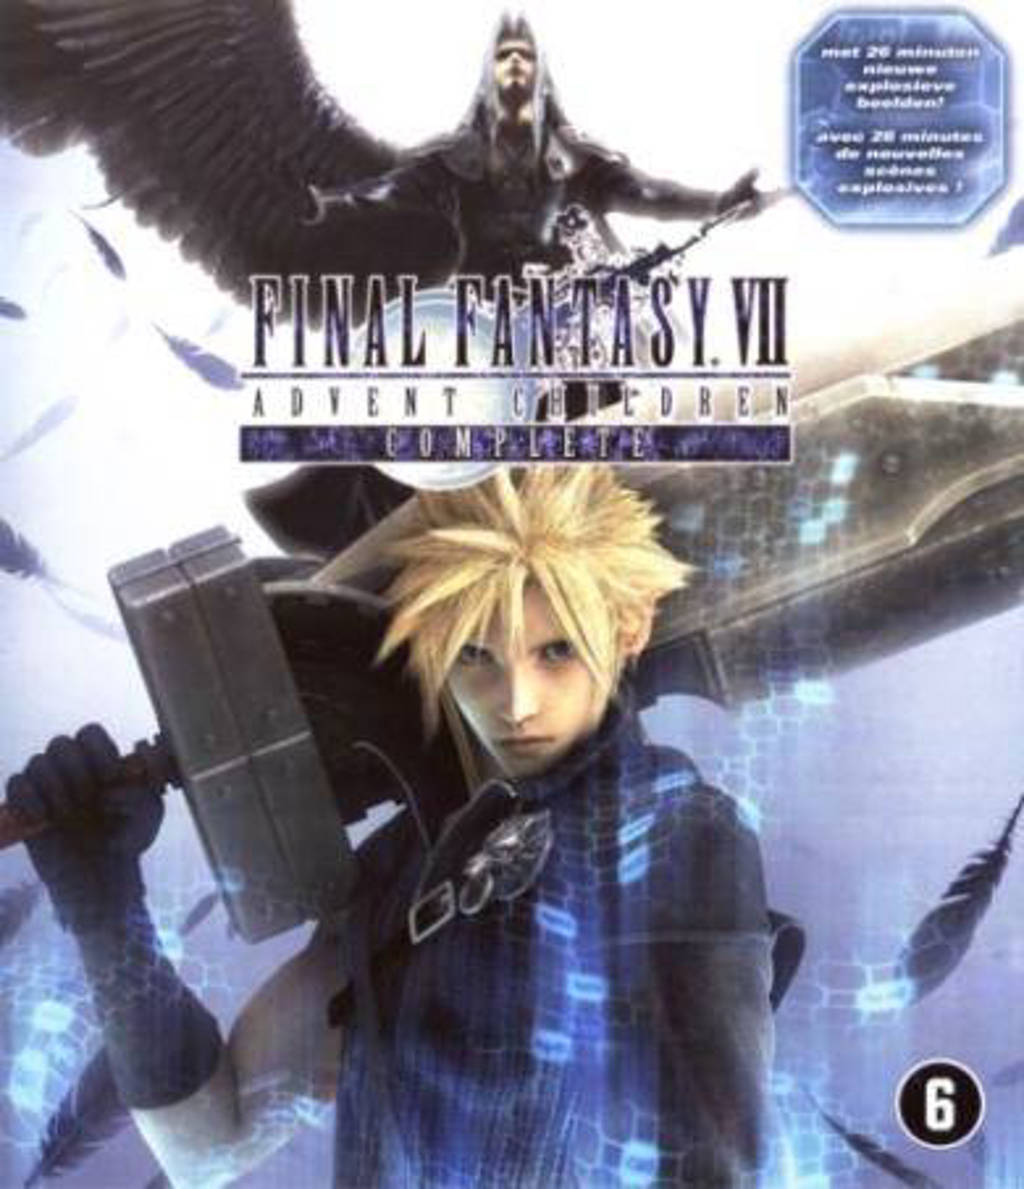 Final fantasy ViI-advent children (Blu-ray)